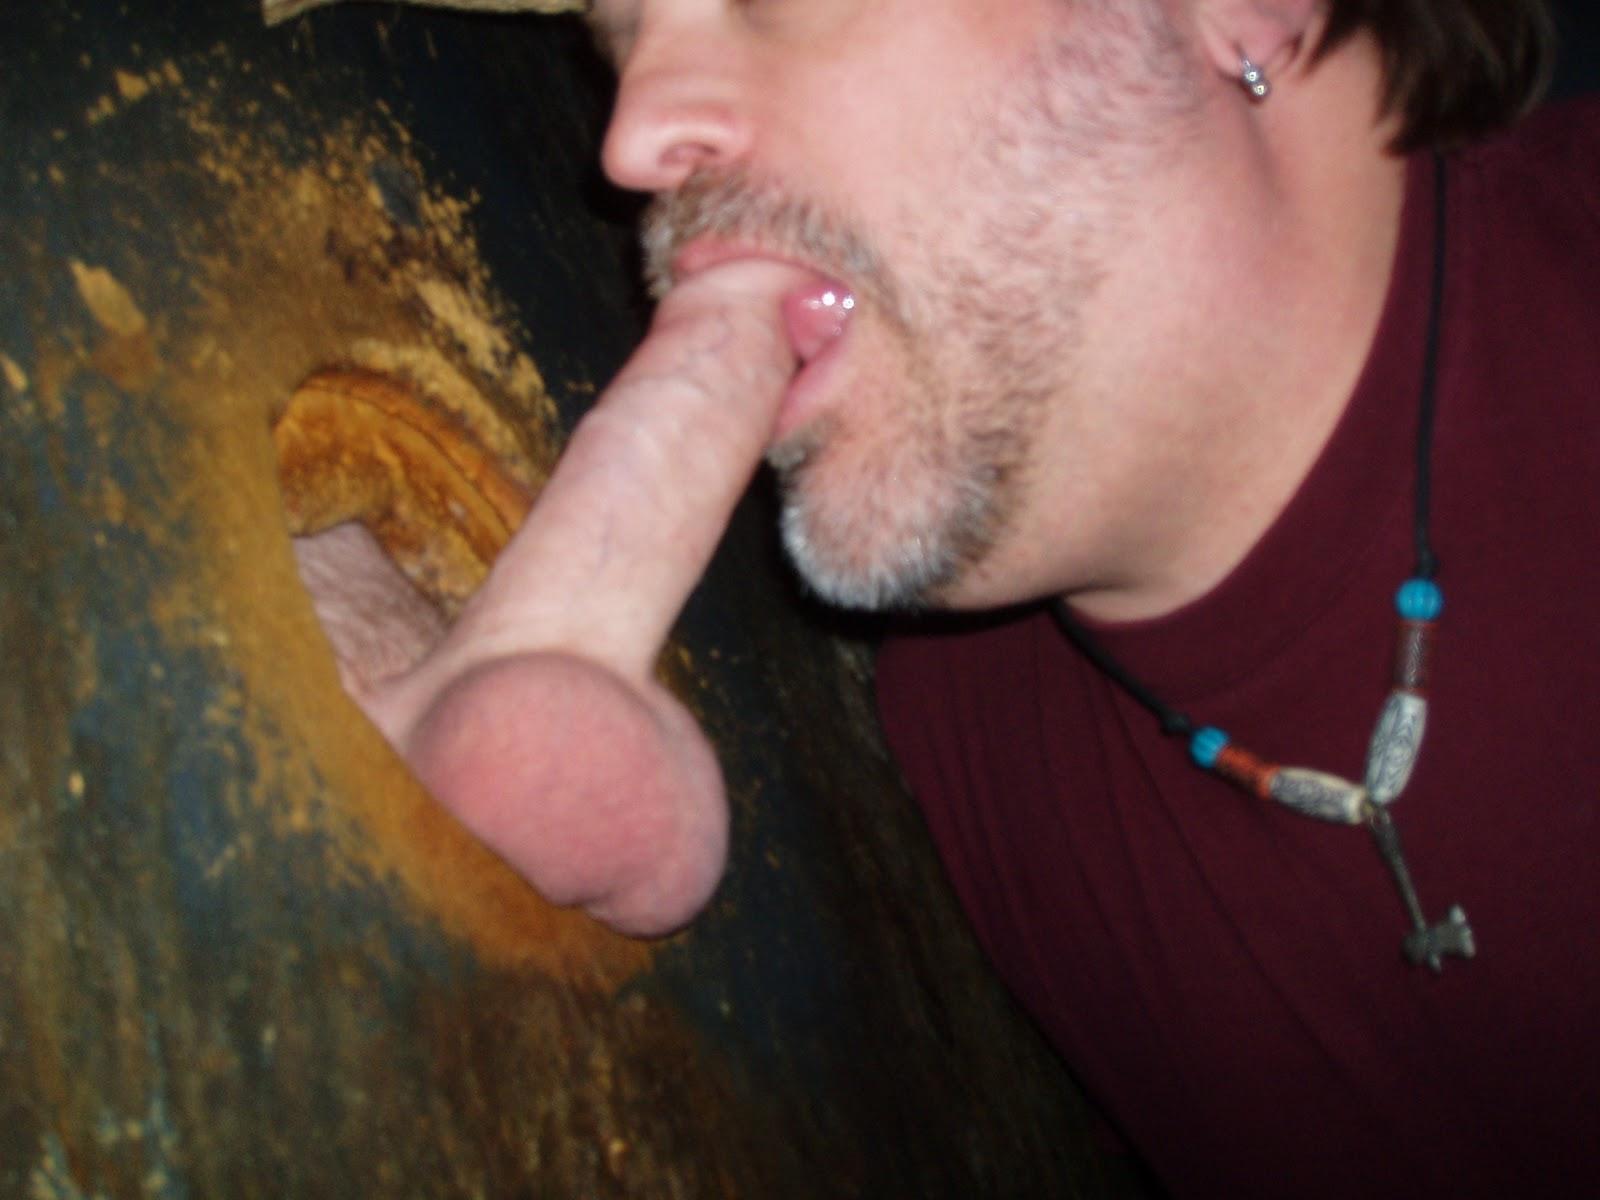 Handjob hole pee